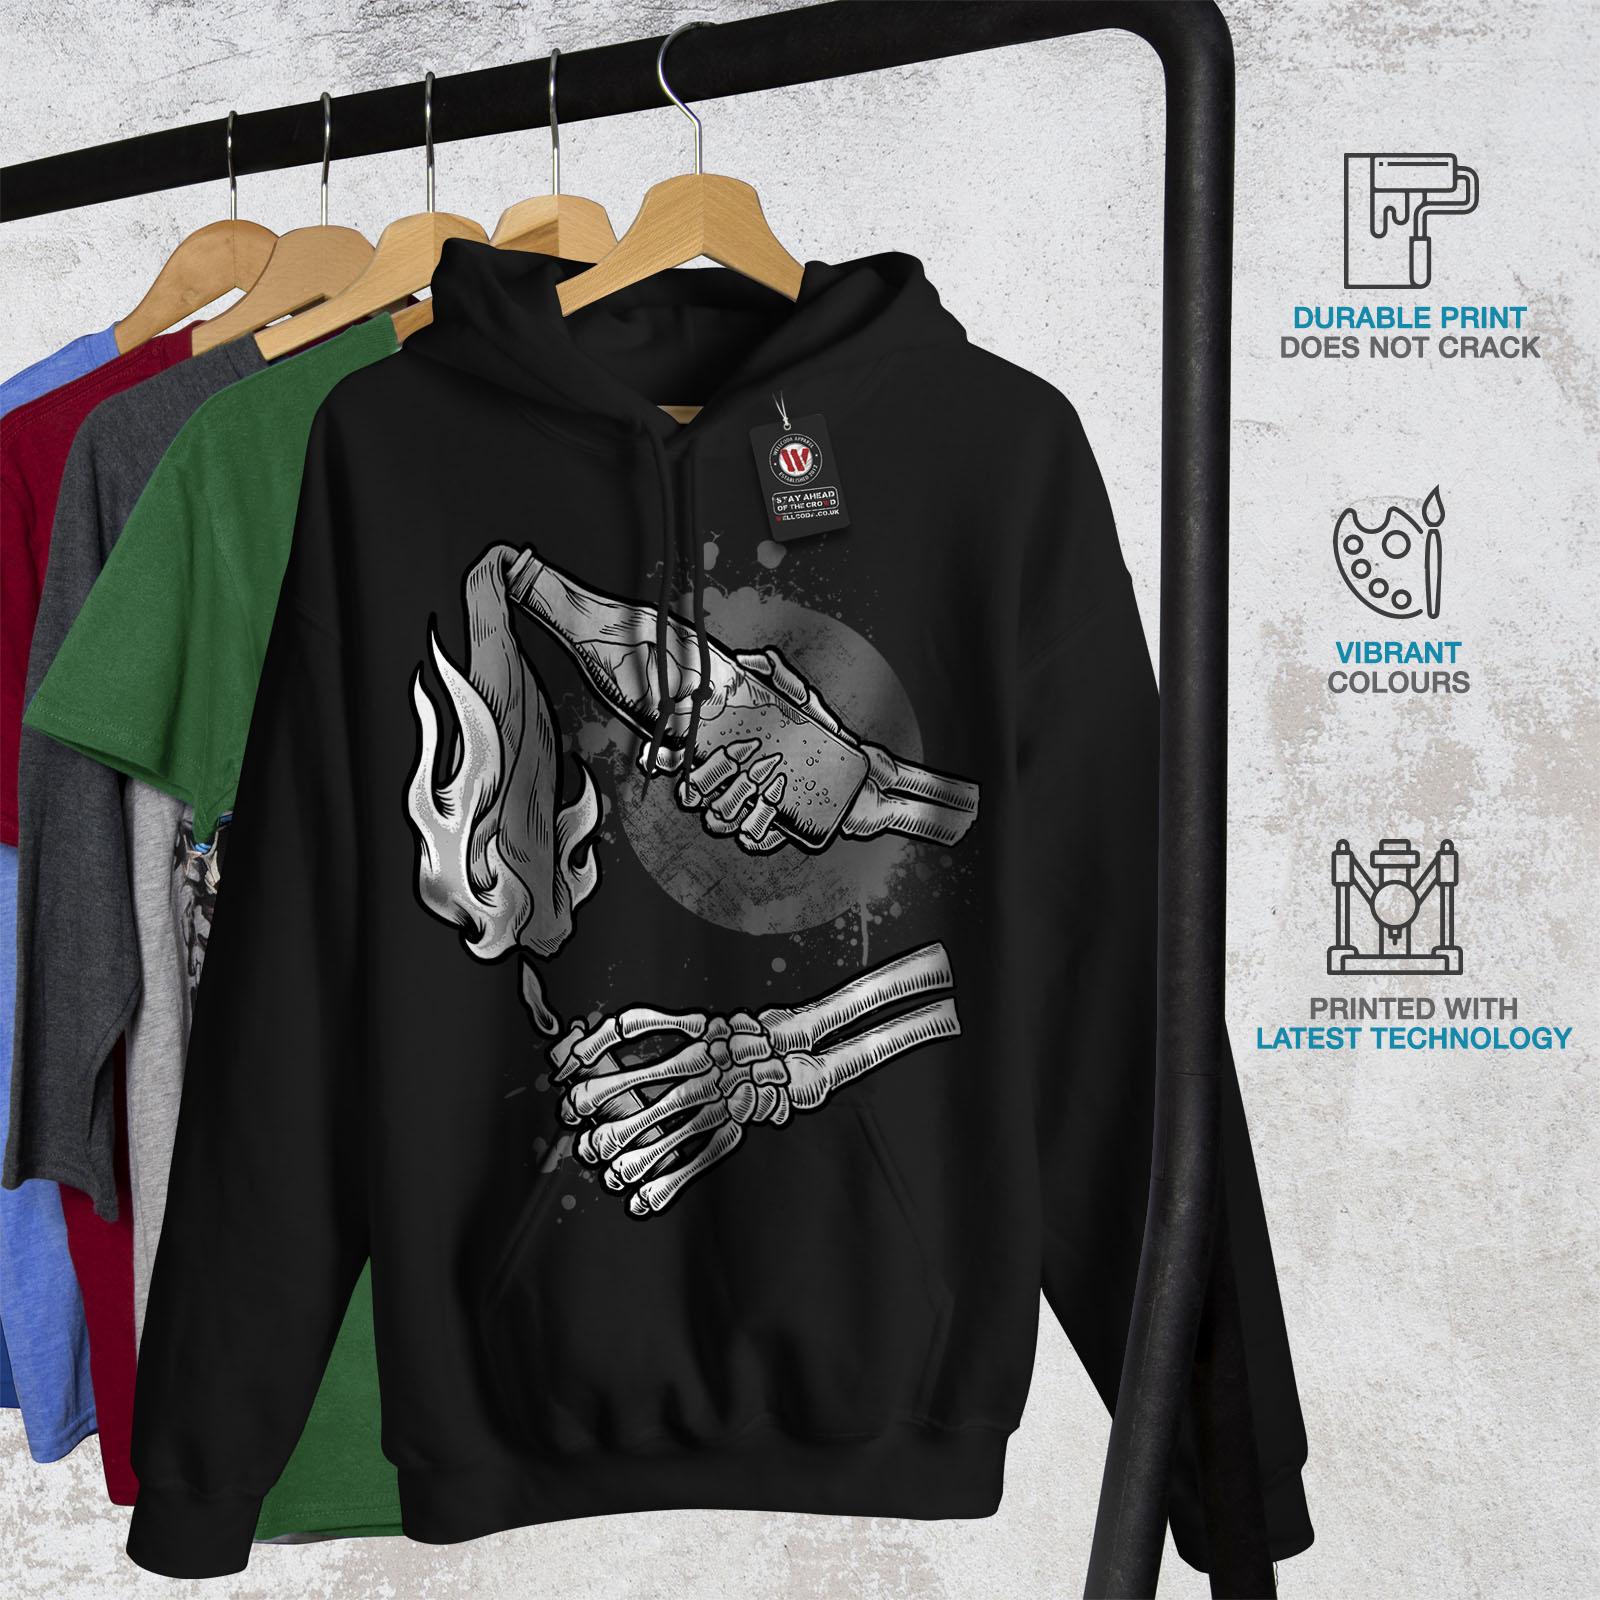 Black Mens Hoodie Sweatshirt New Hooded Casual Wellcoda Bad qRPxn0